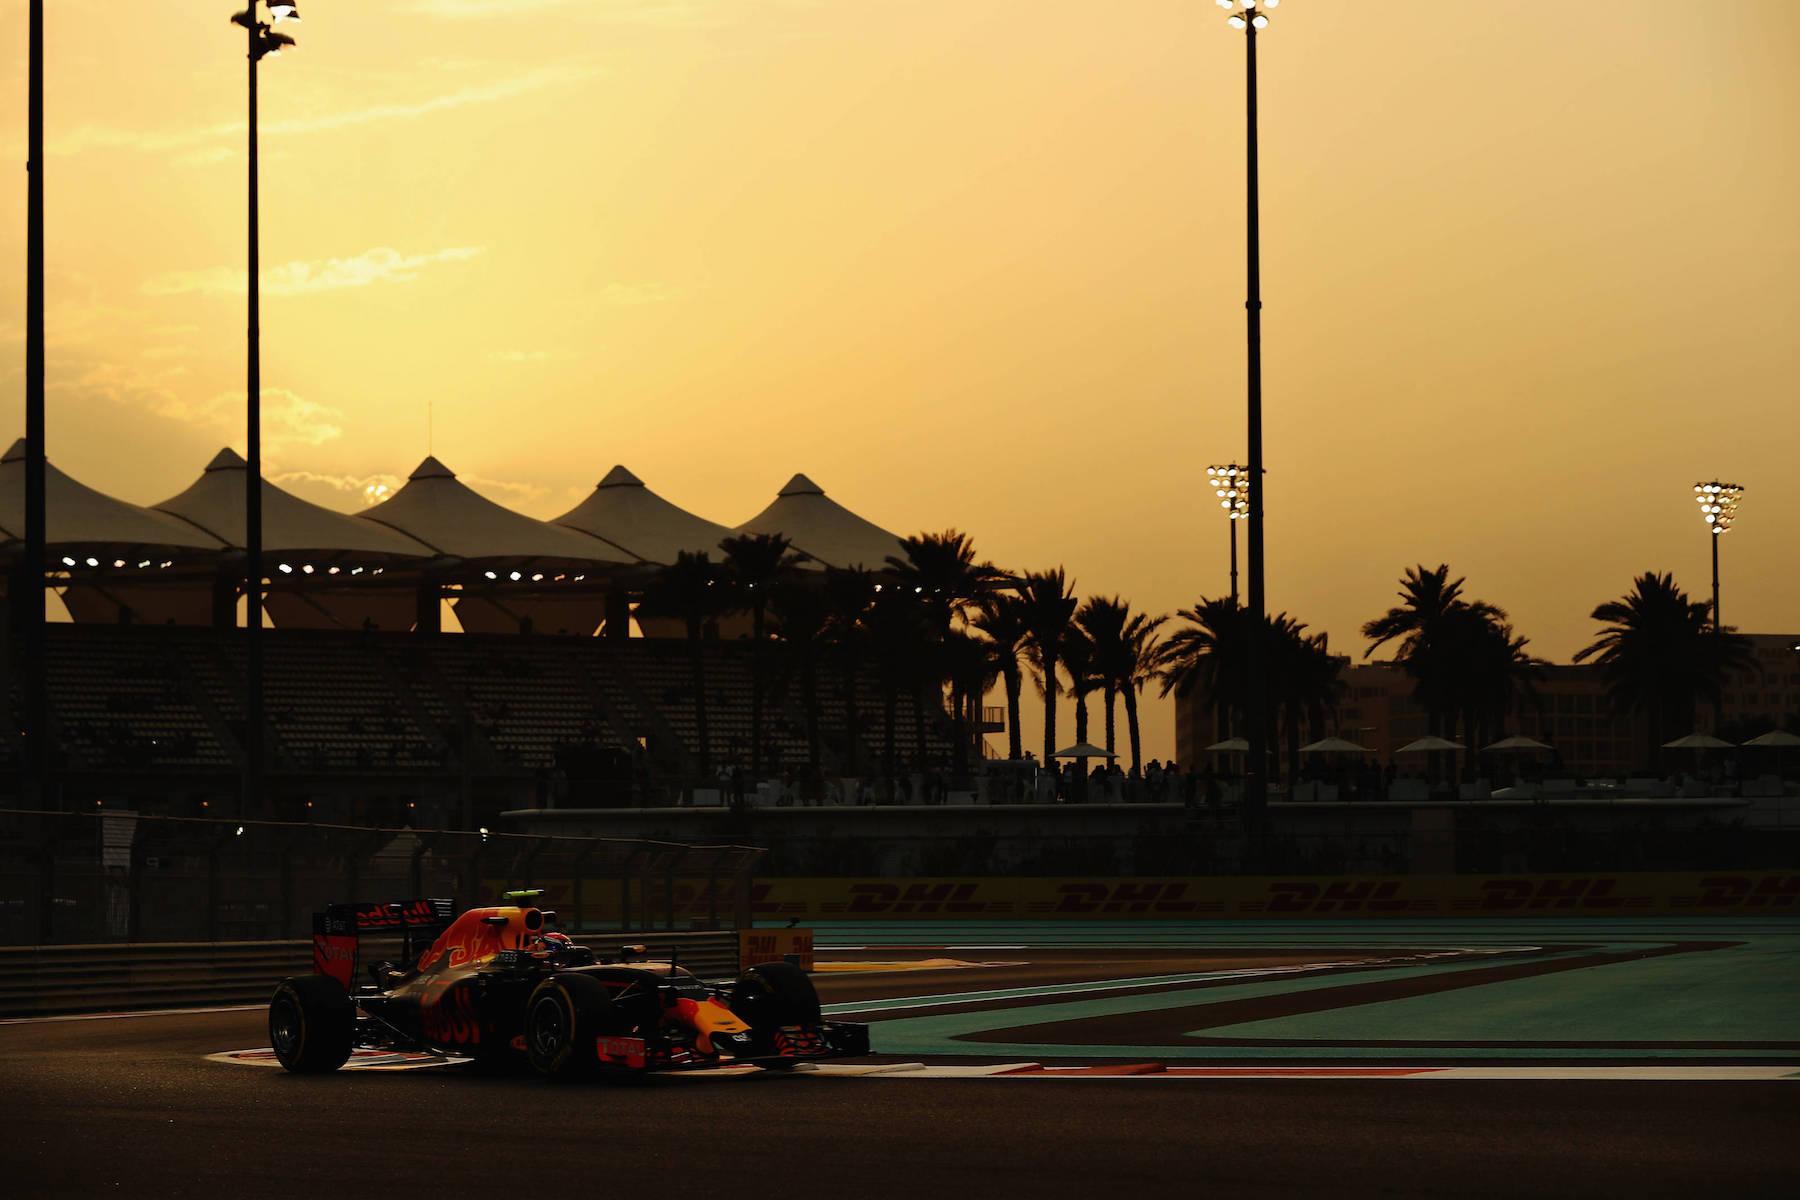 Salracing - Max Verstappen | Red Bull Racing